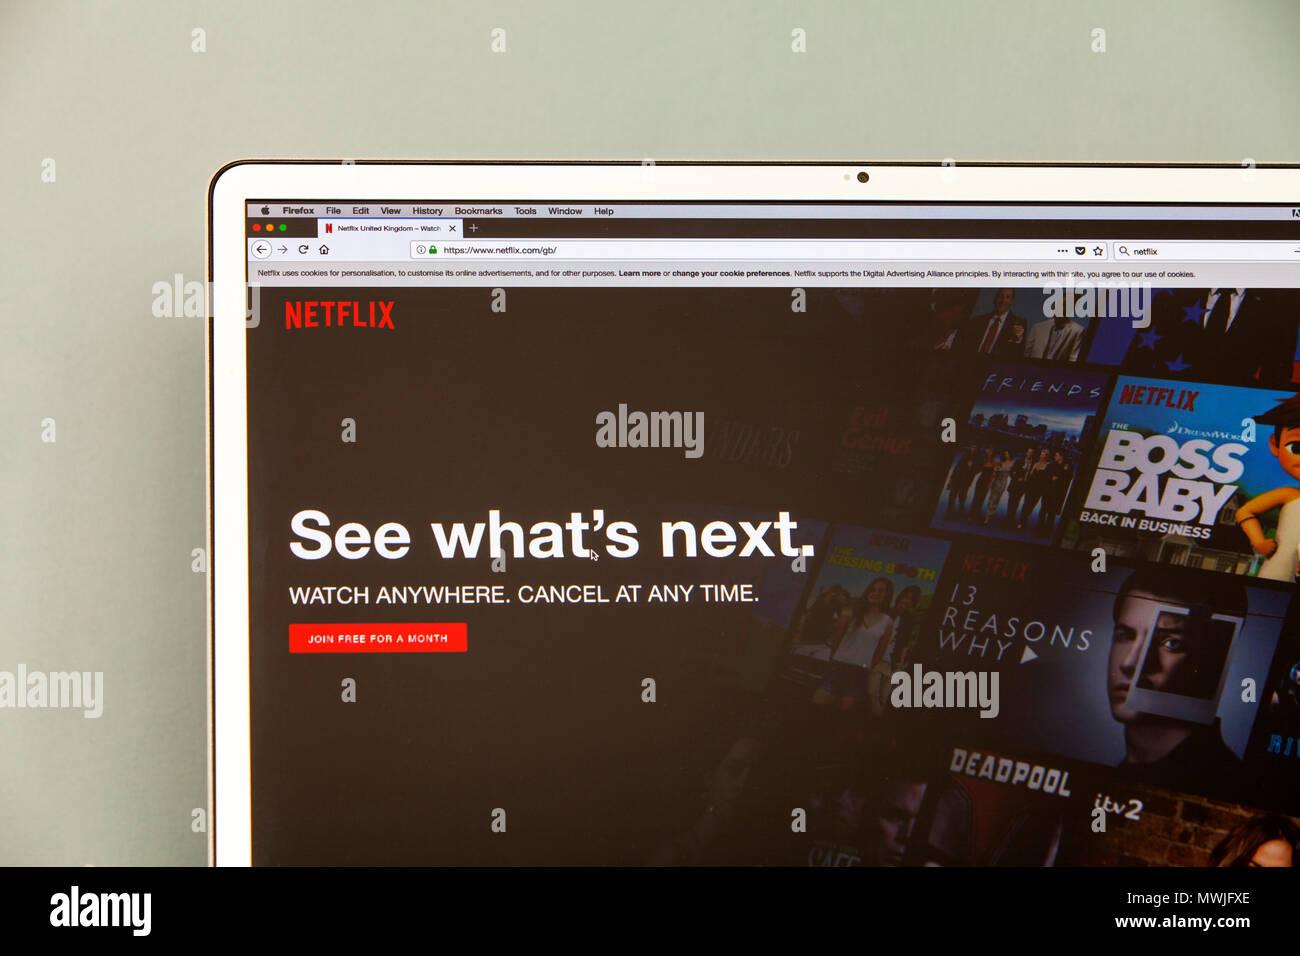 Homepage di Netflix, Netflix.com, Netflix servizio streaming di Netflix, pellicole, Netflix, sullo schermo il logo di Netflix, filmati Netflix & mostra online online Netflix Immagini Stock